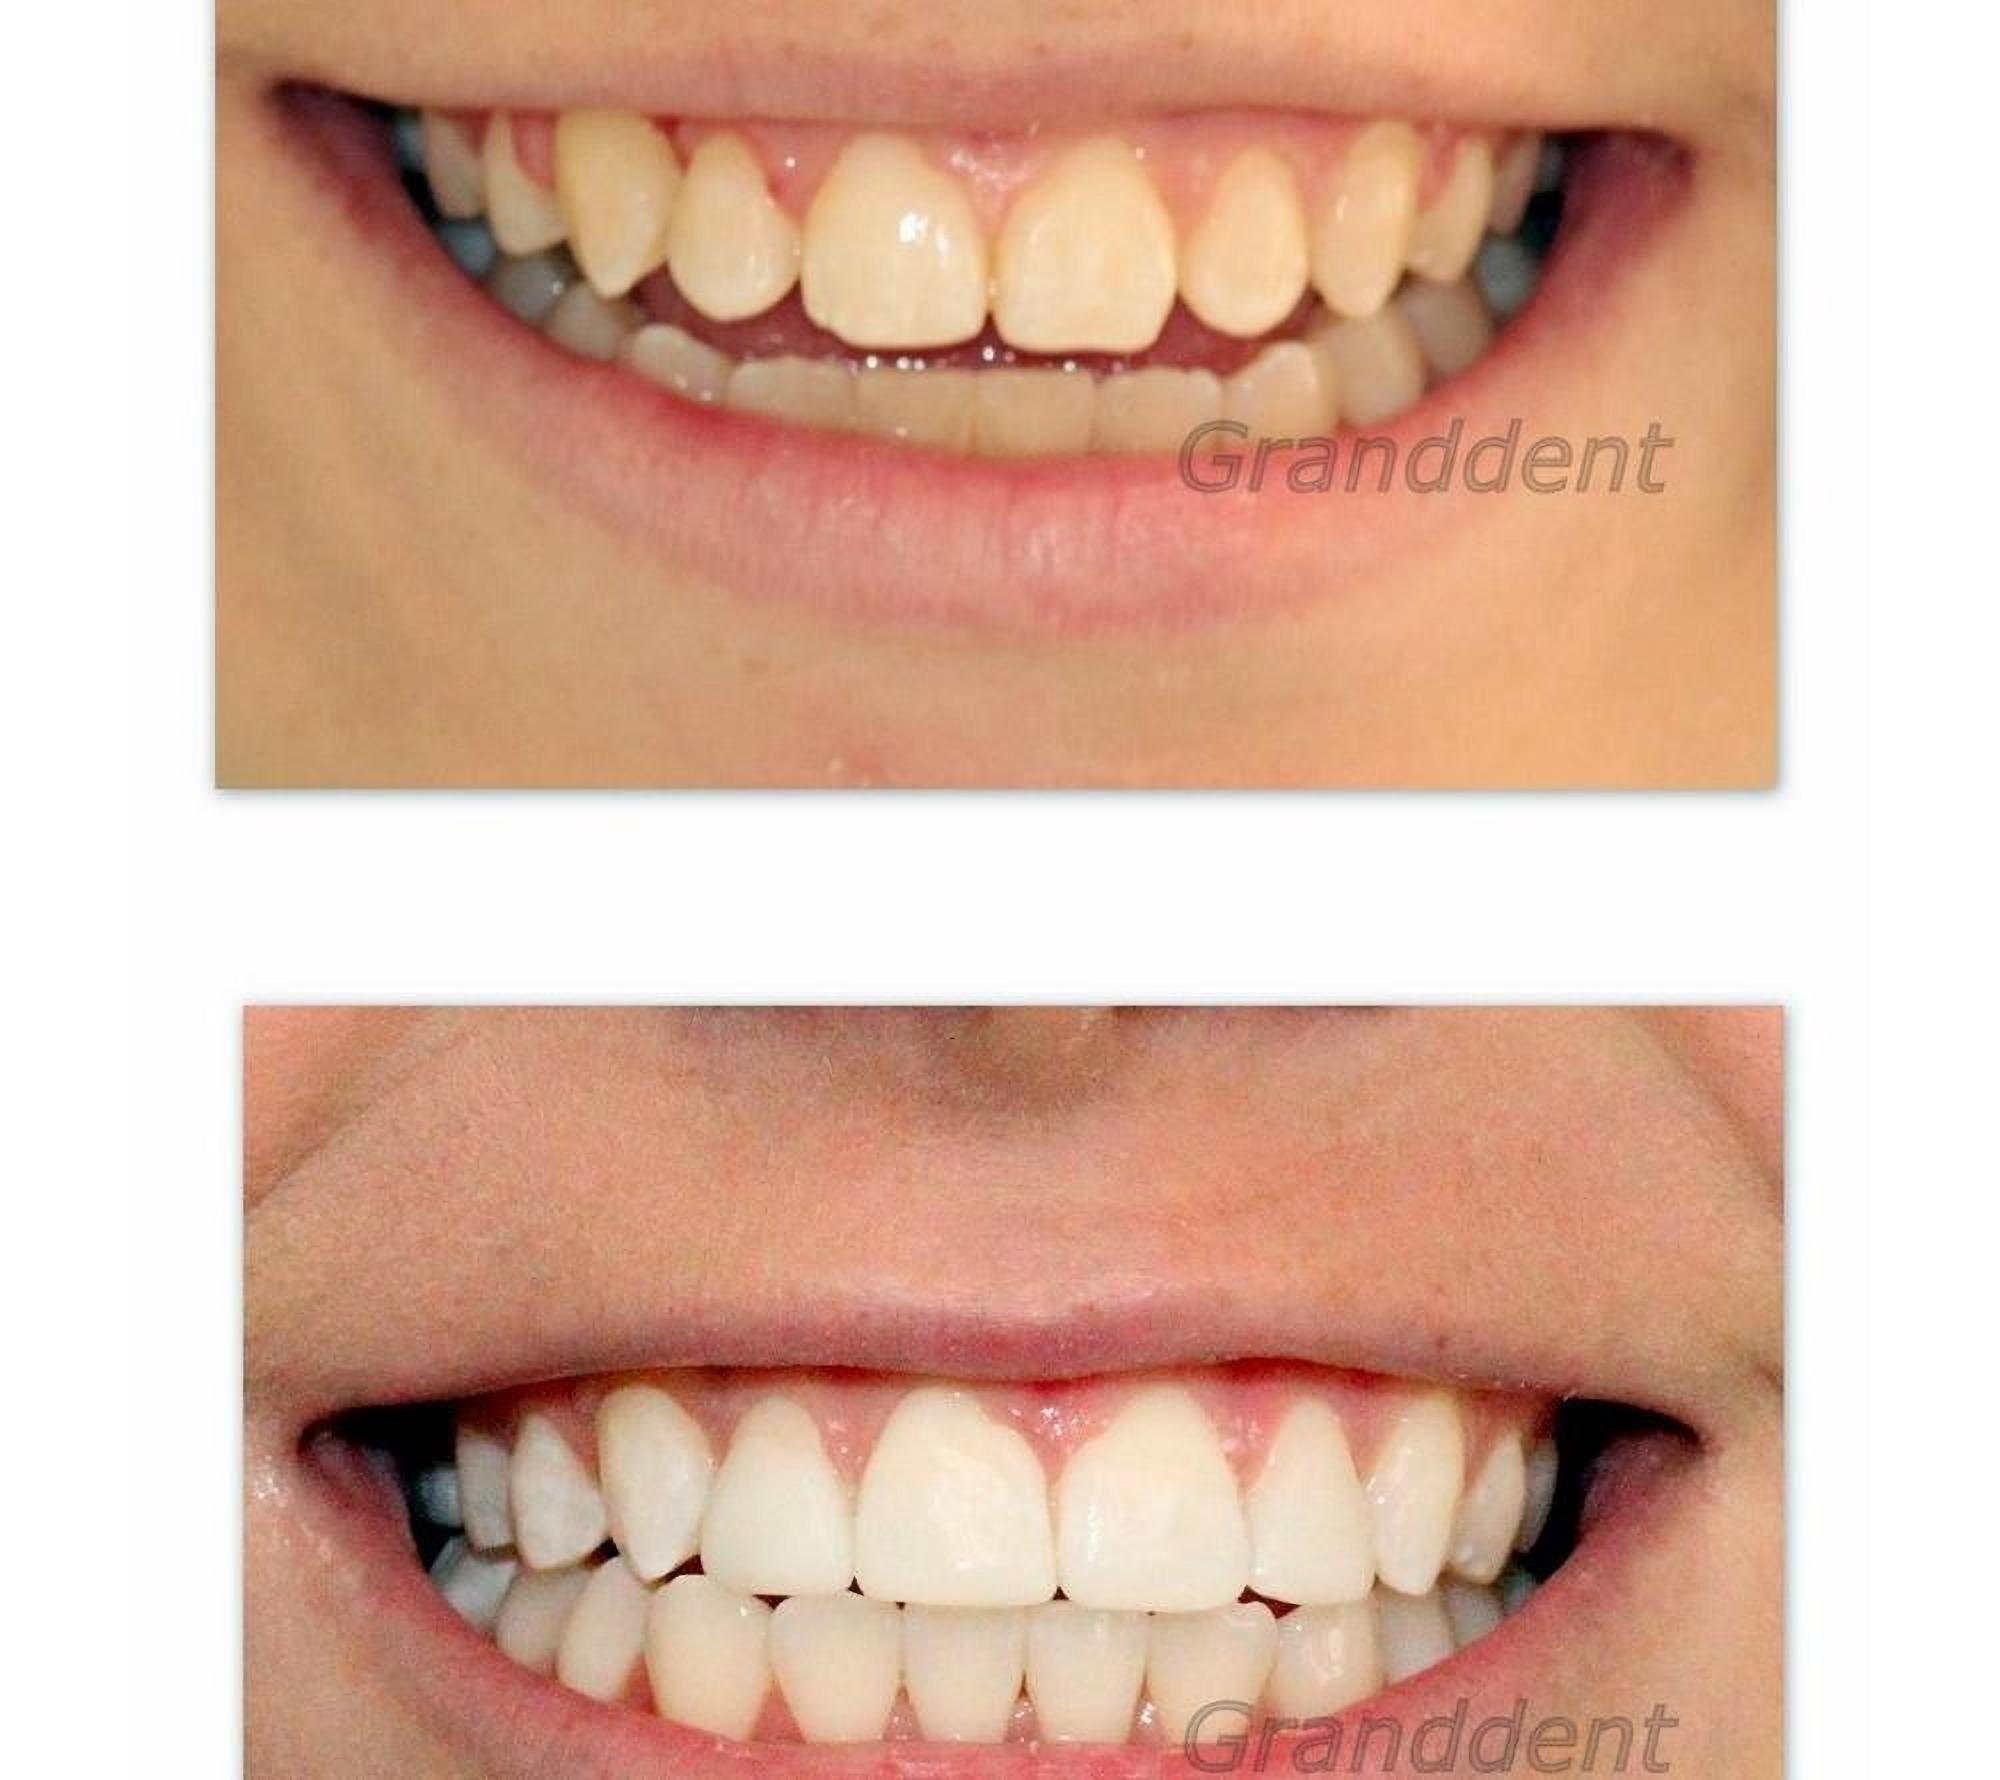 Dental treatment in the dental clinic Granddent in Odessa Ukraine